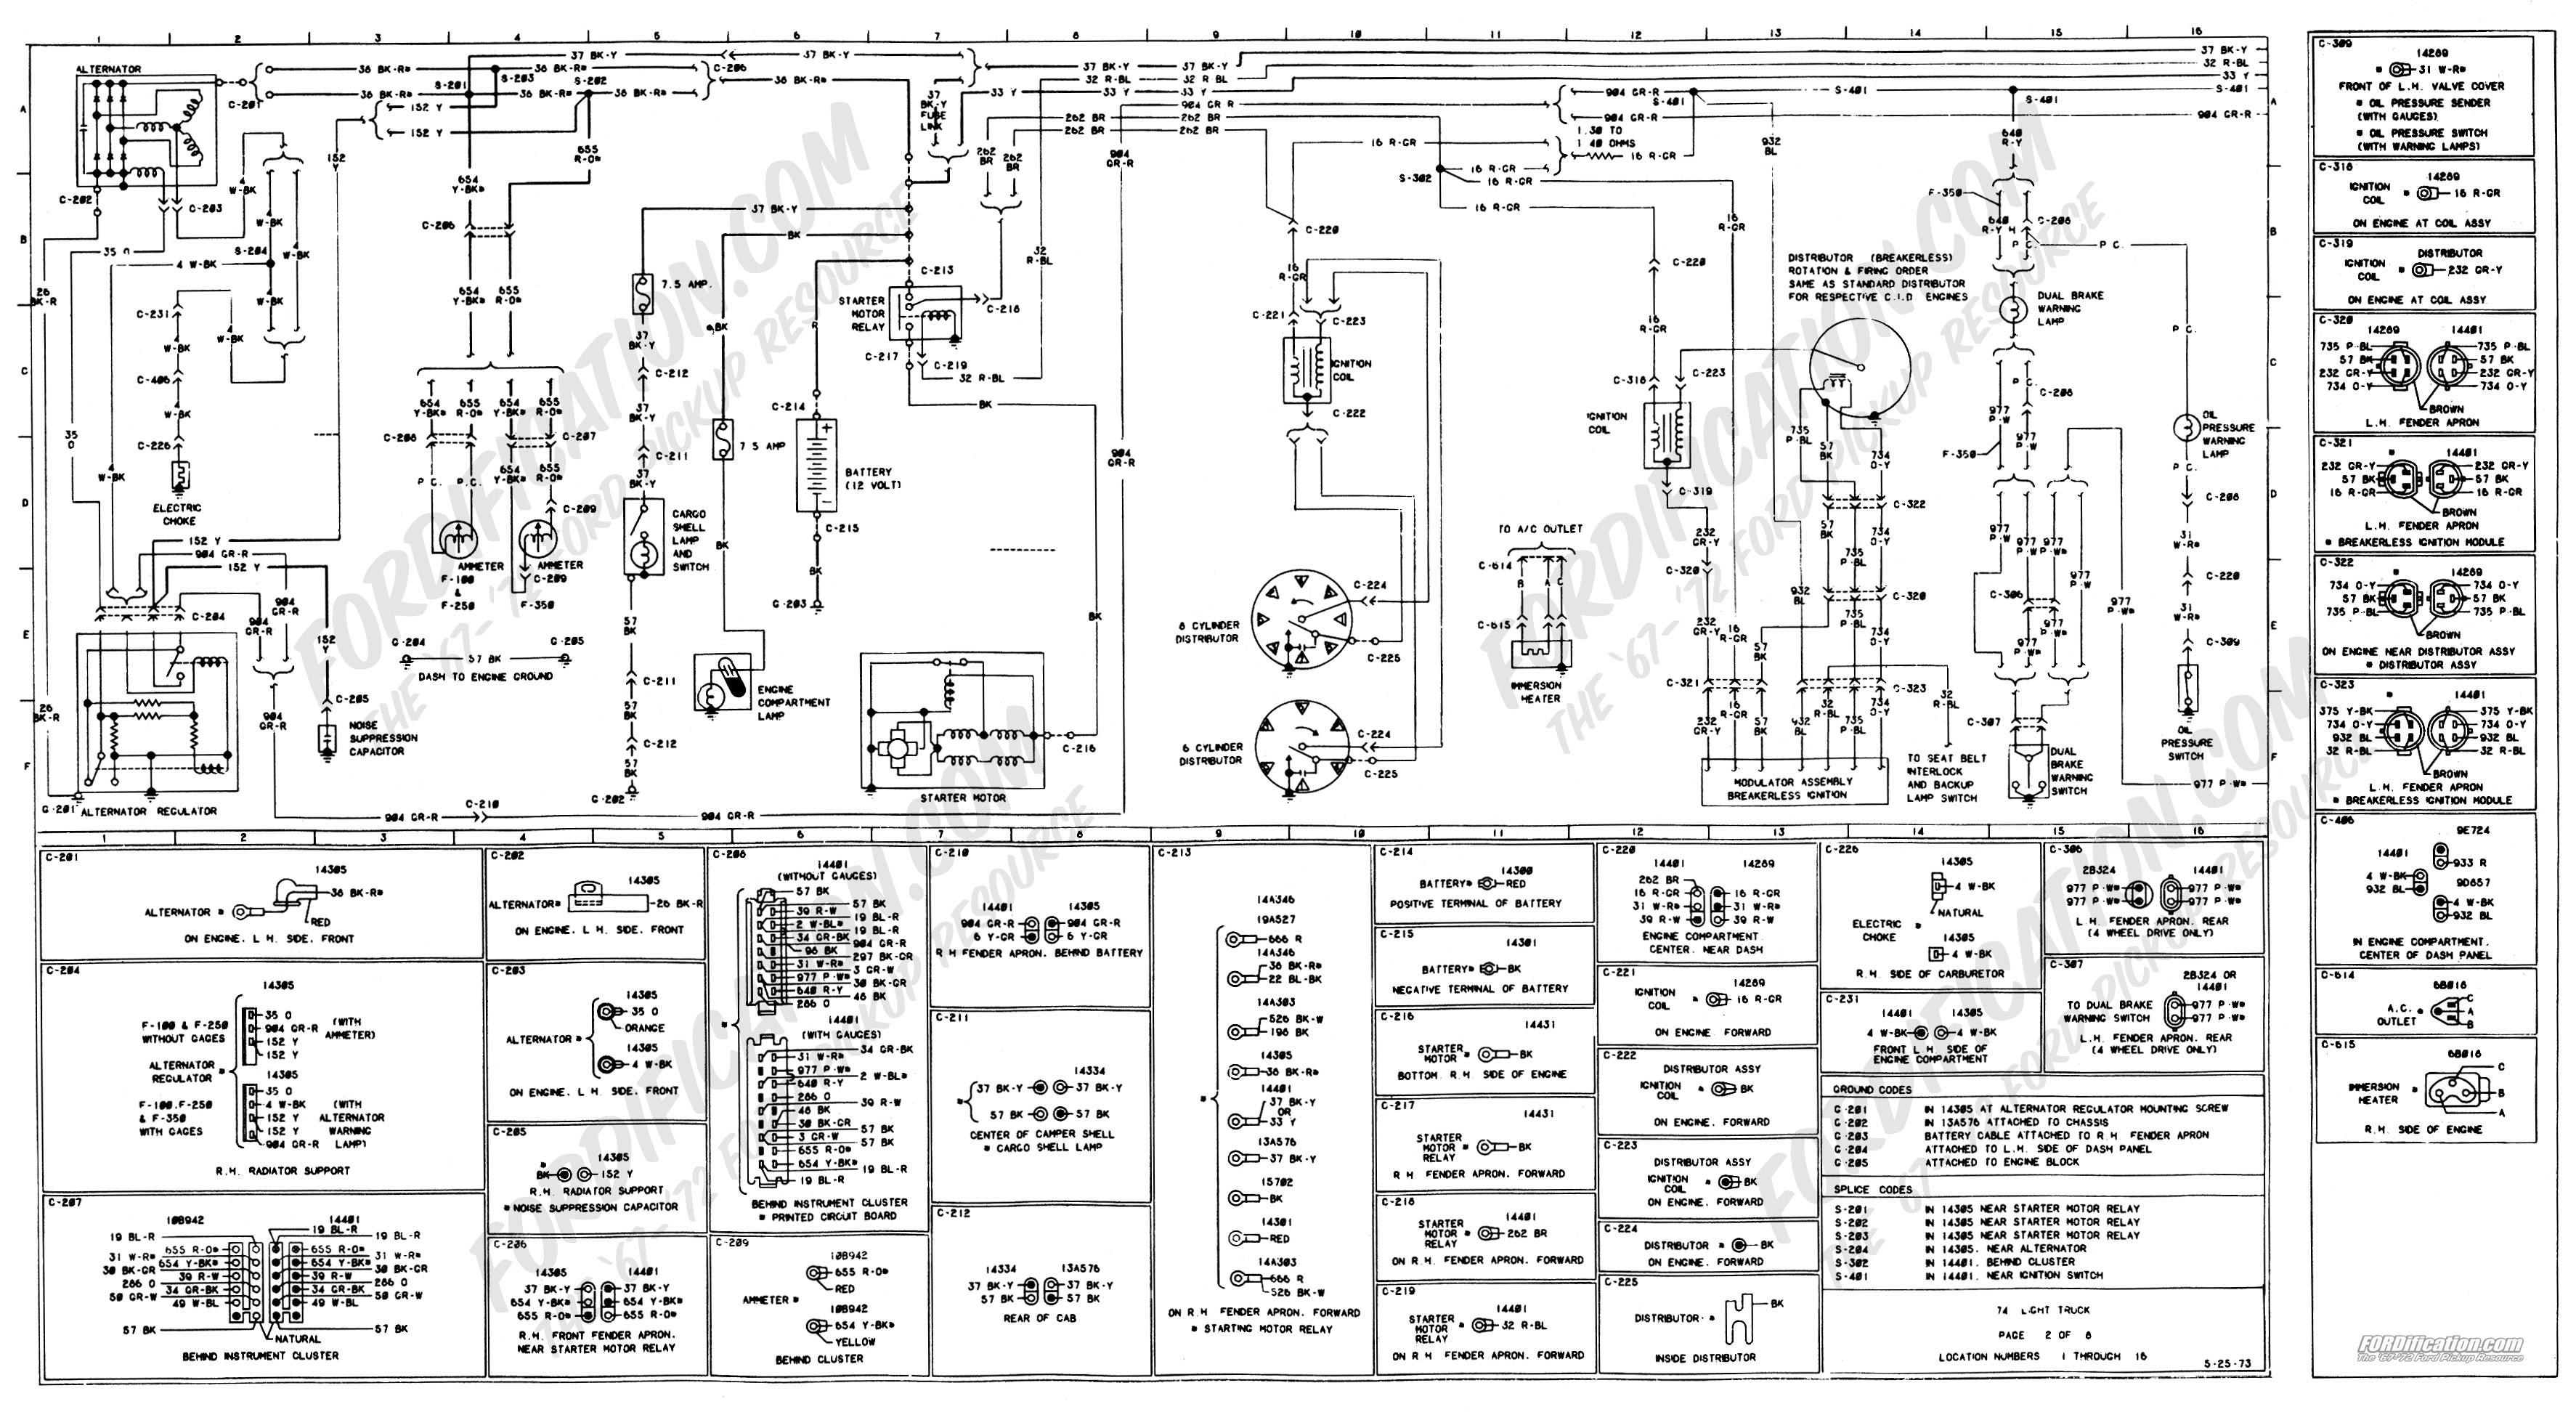 77 Ford F250 Wiring Diagram Wiring Diagram Database